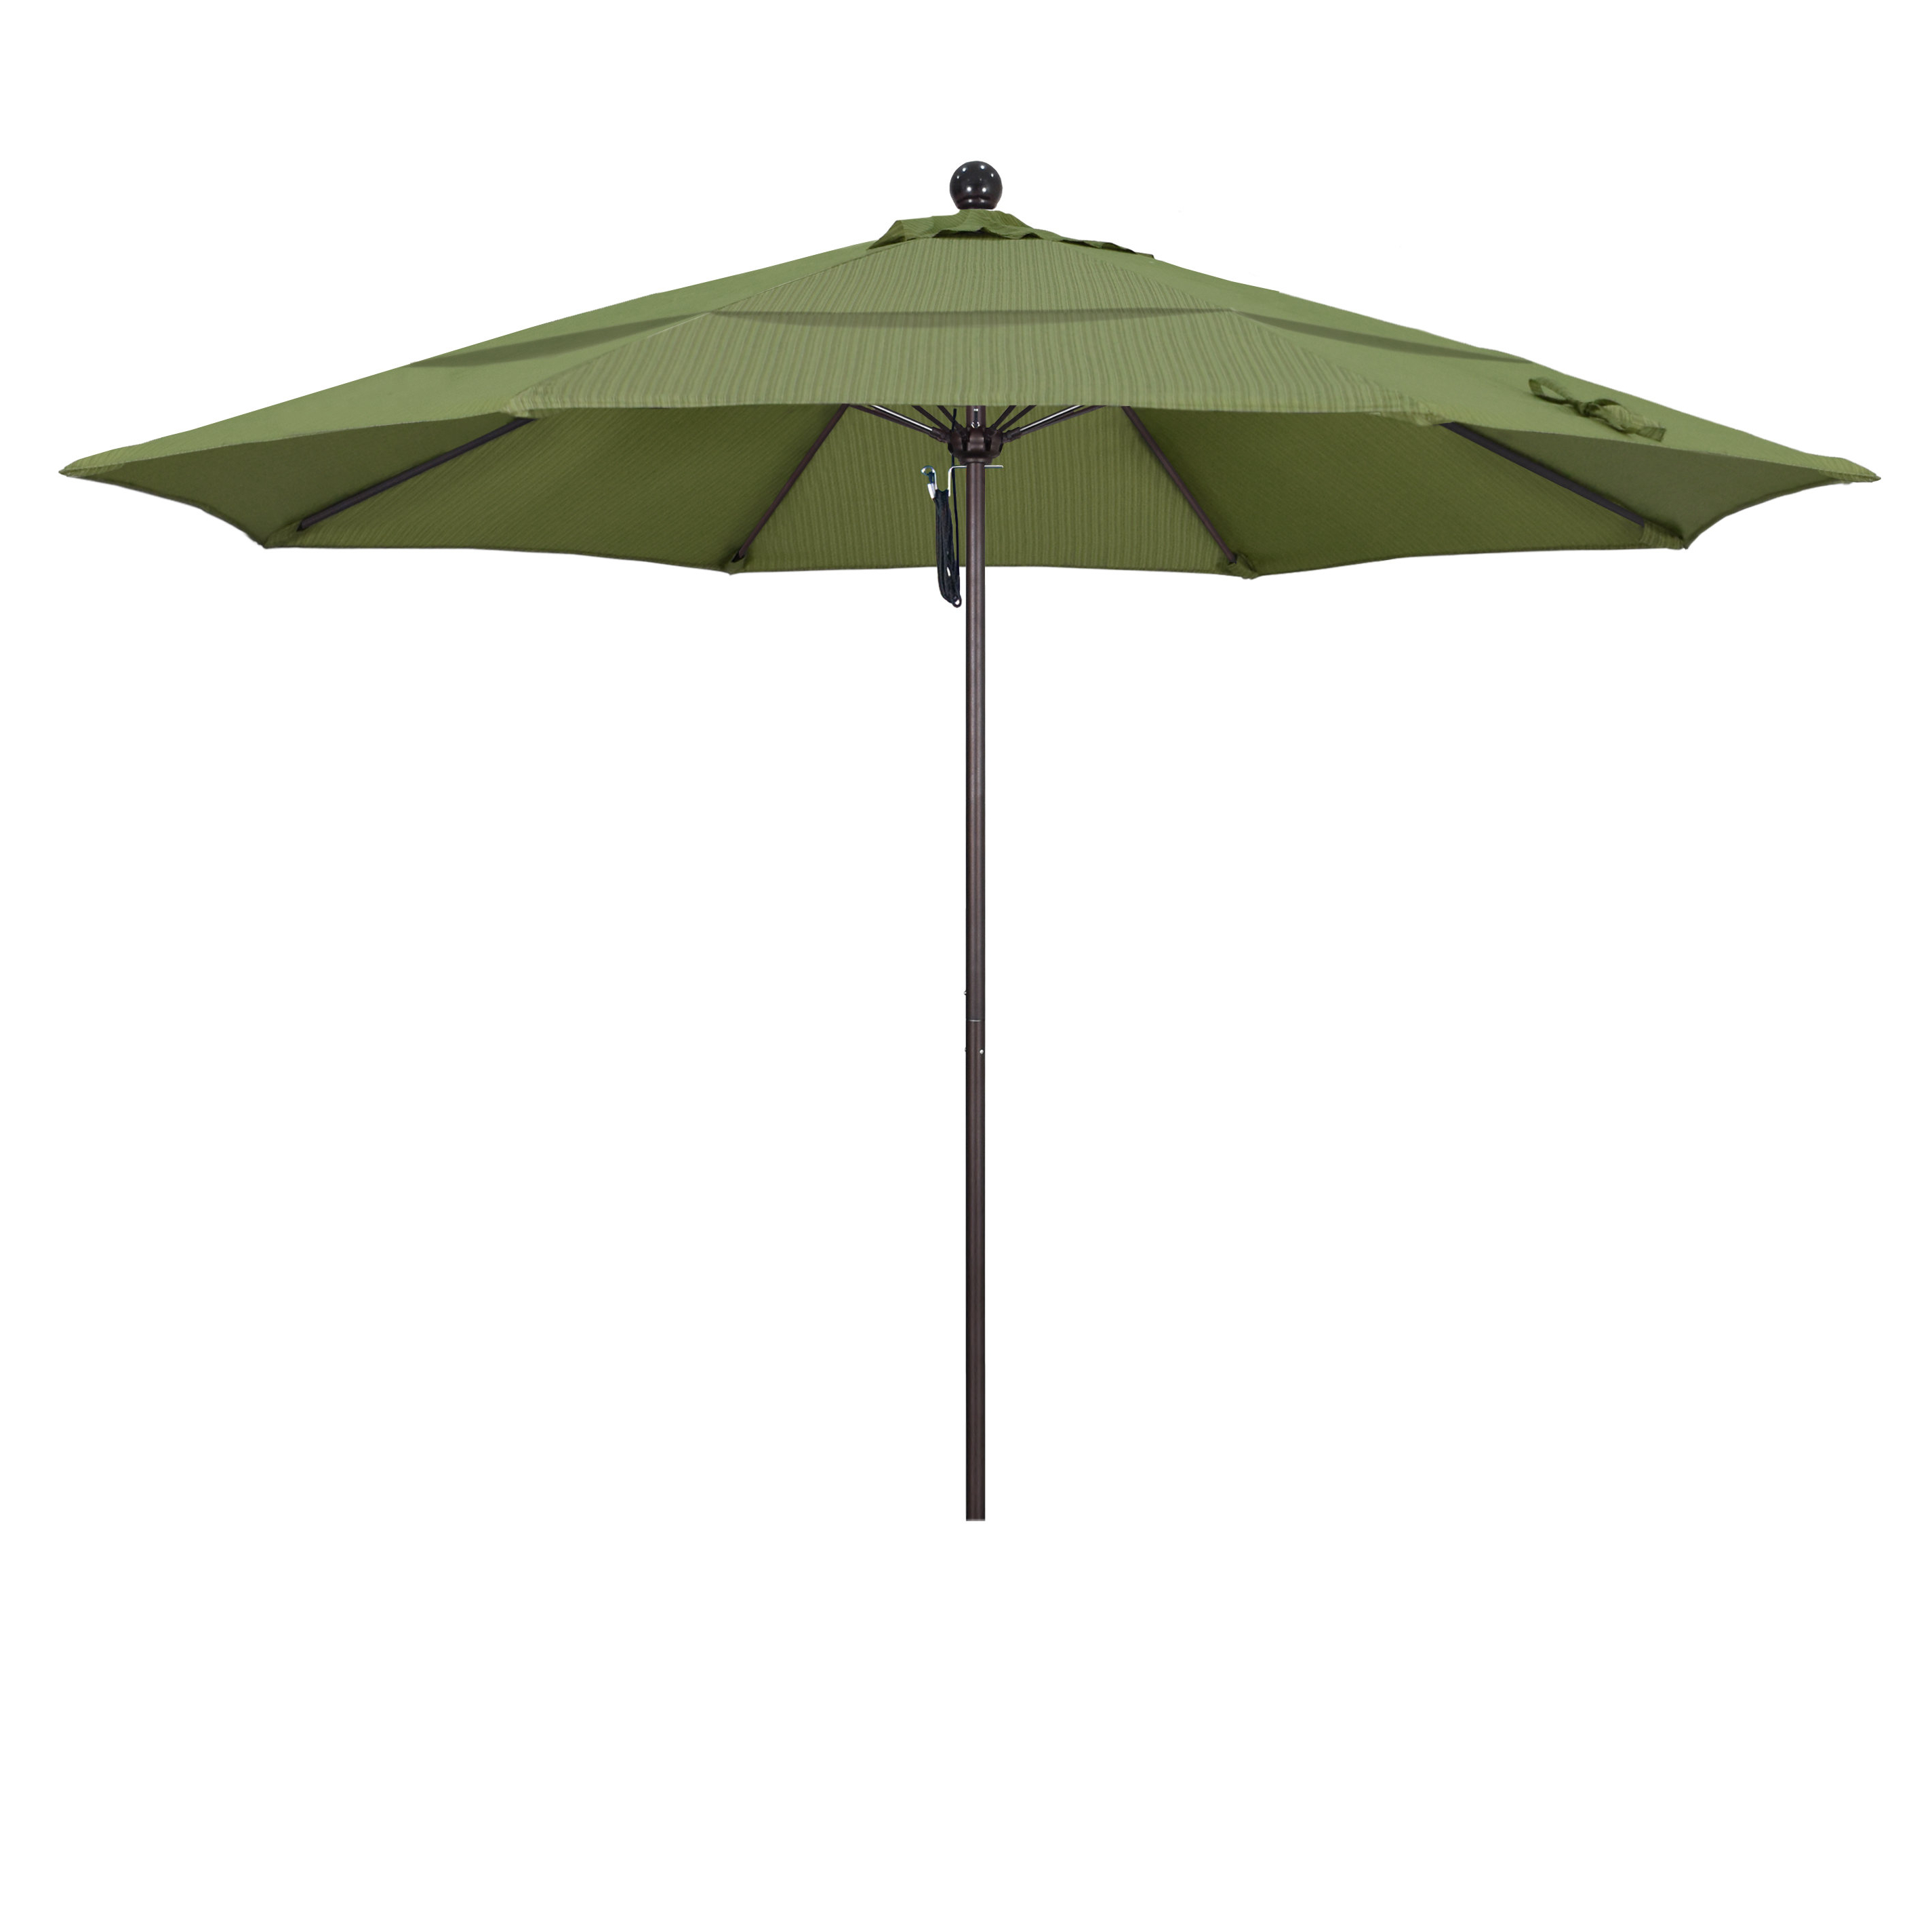 Popular Mraz Market Umbrellas Regarding Benson 11' Market Umbrella (View 11 of 20)